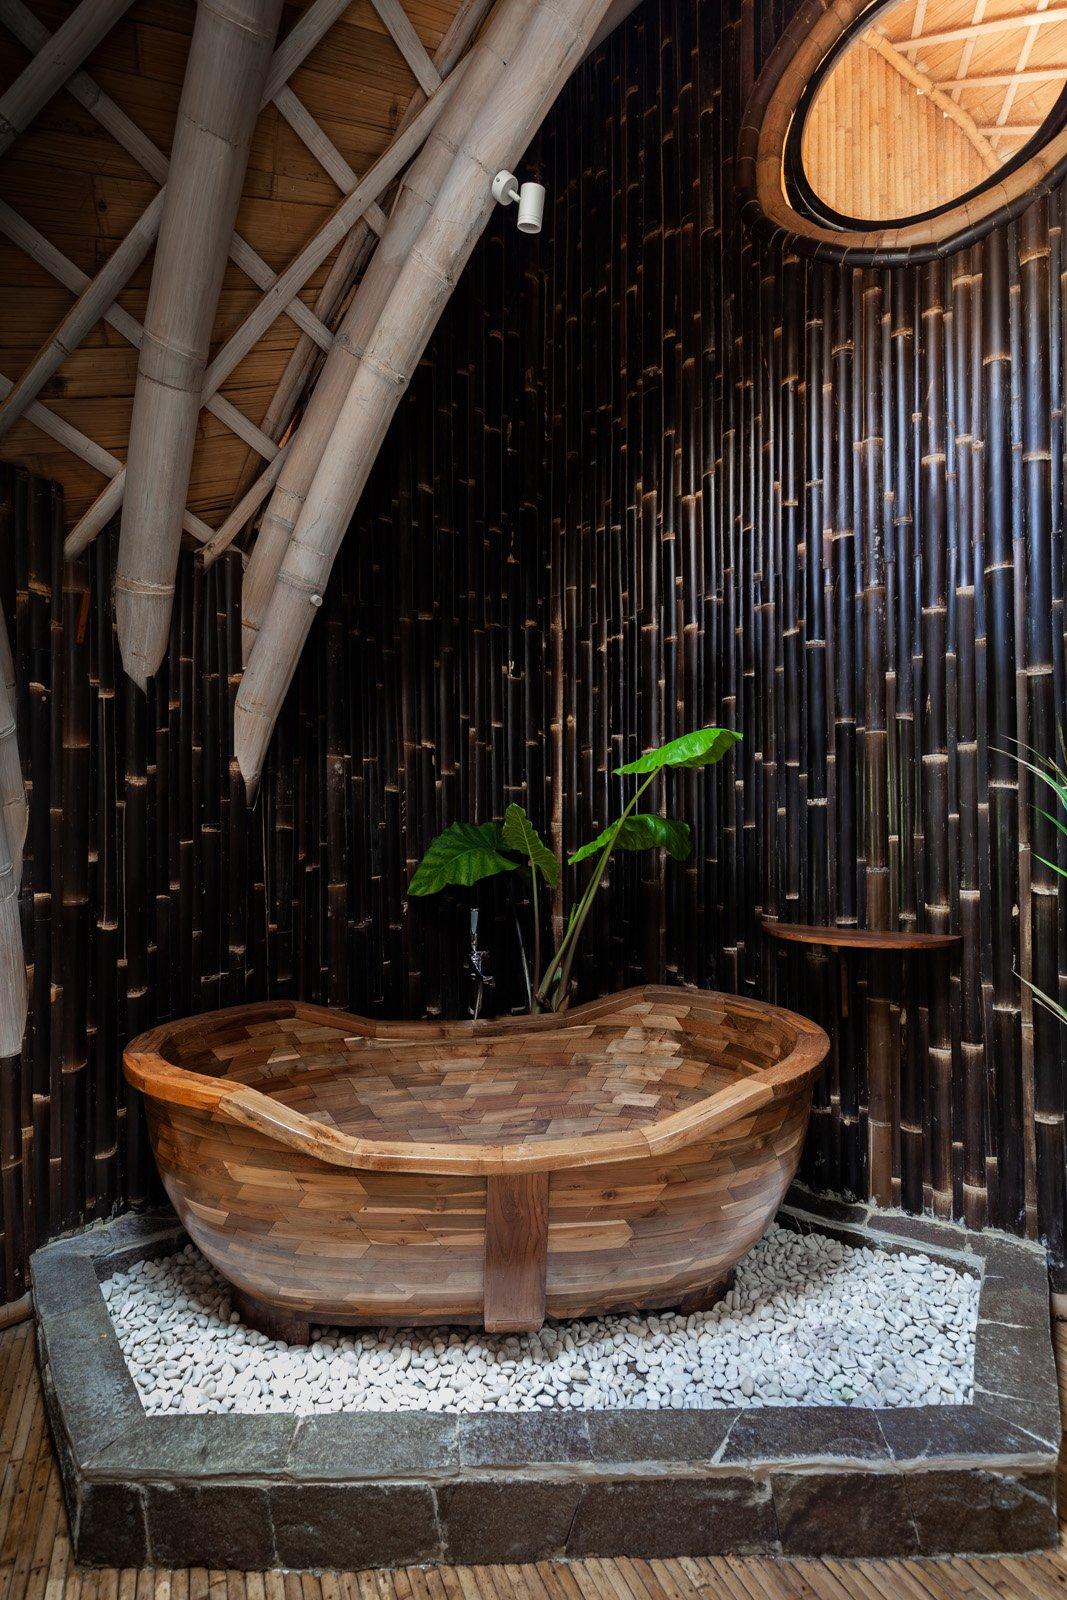 Ulaman Eco Resort, Bali Interiors- bamboo architecture